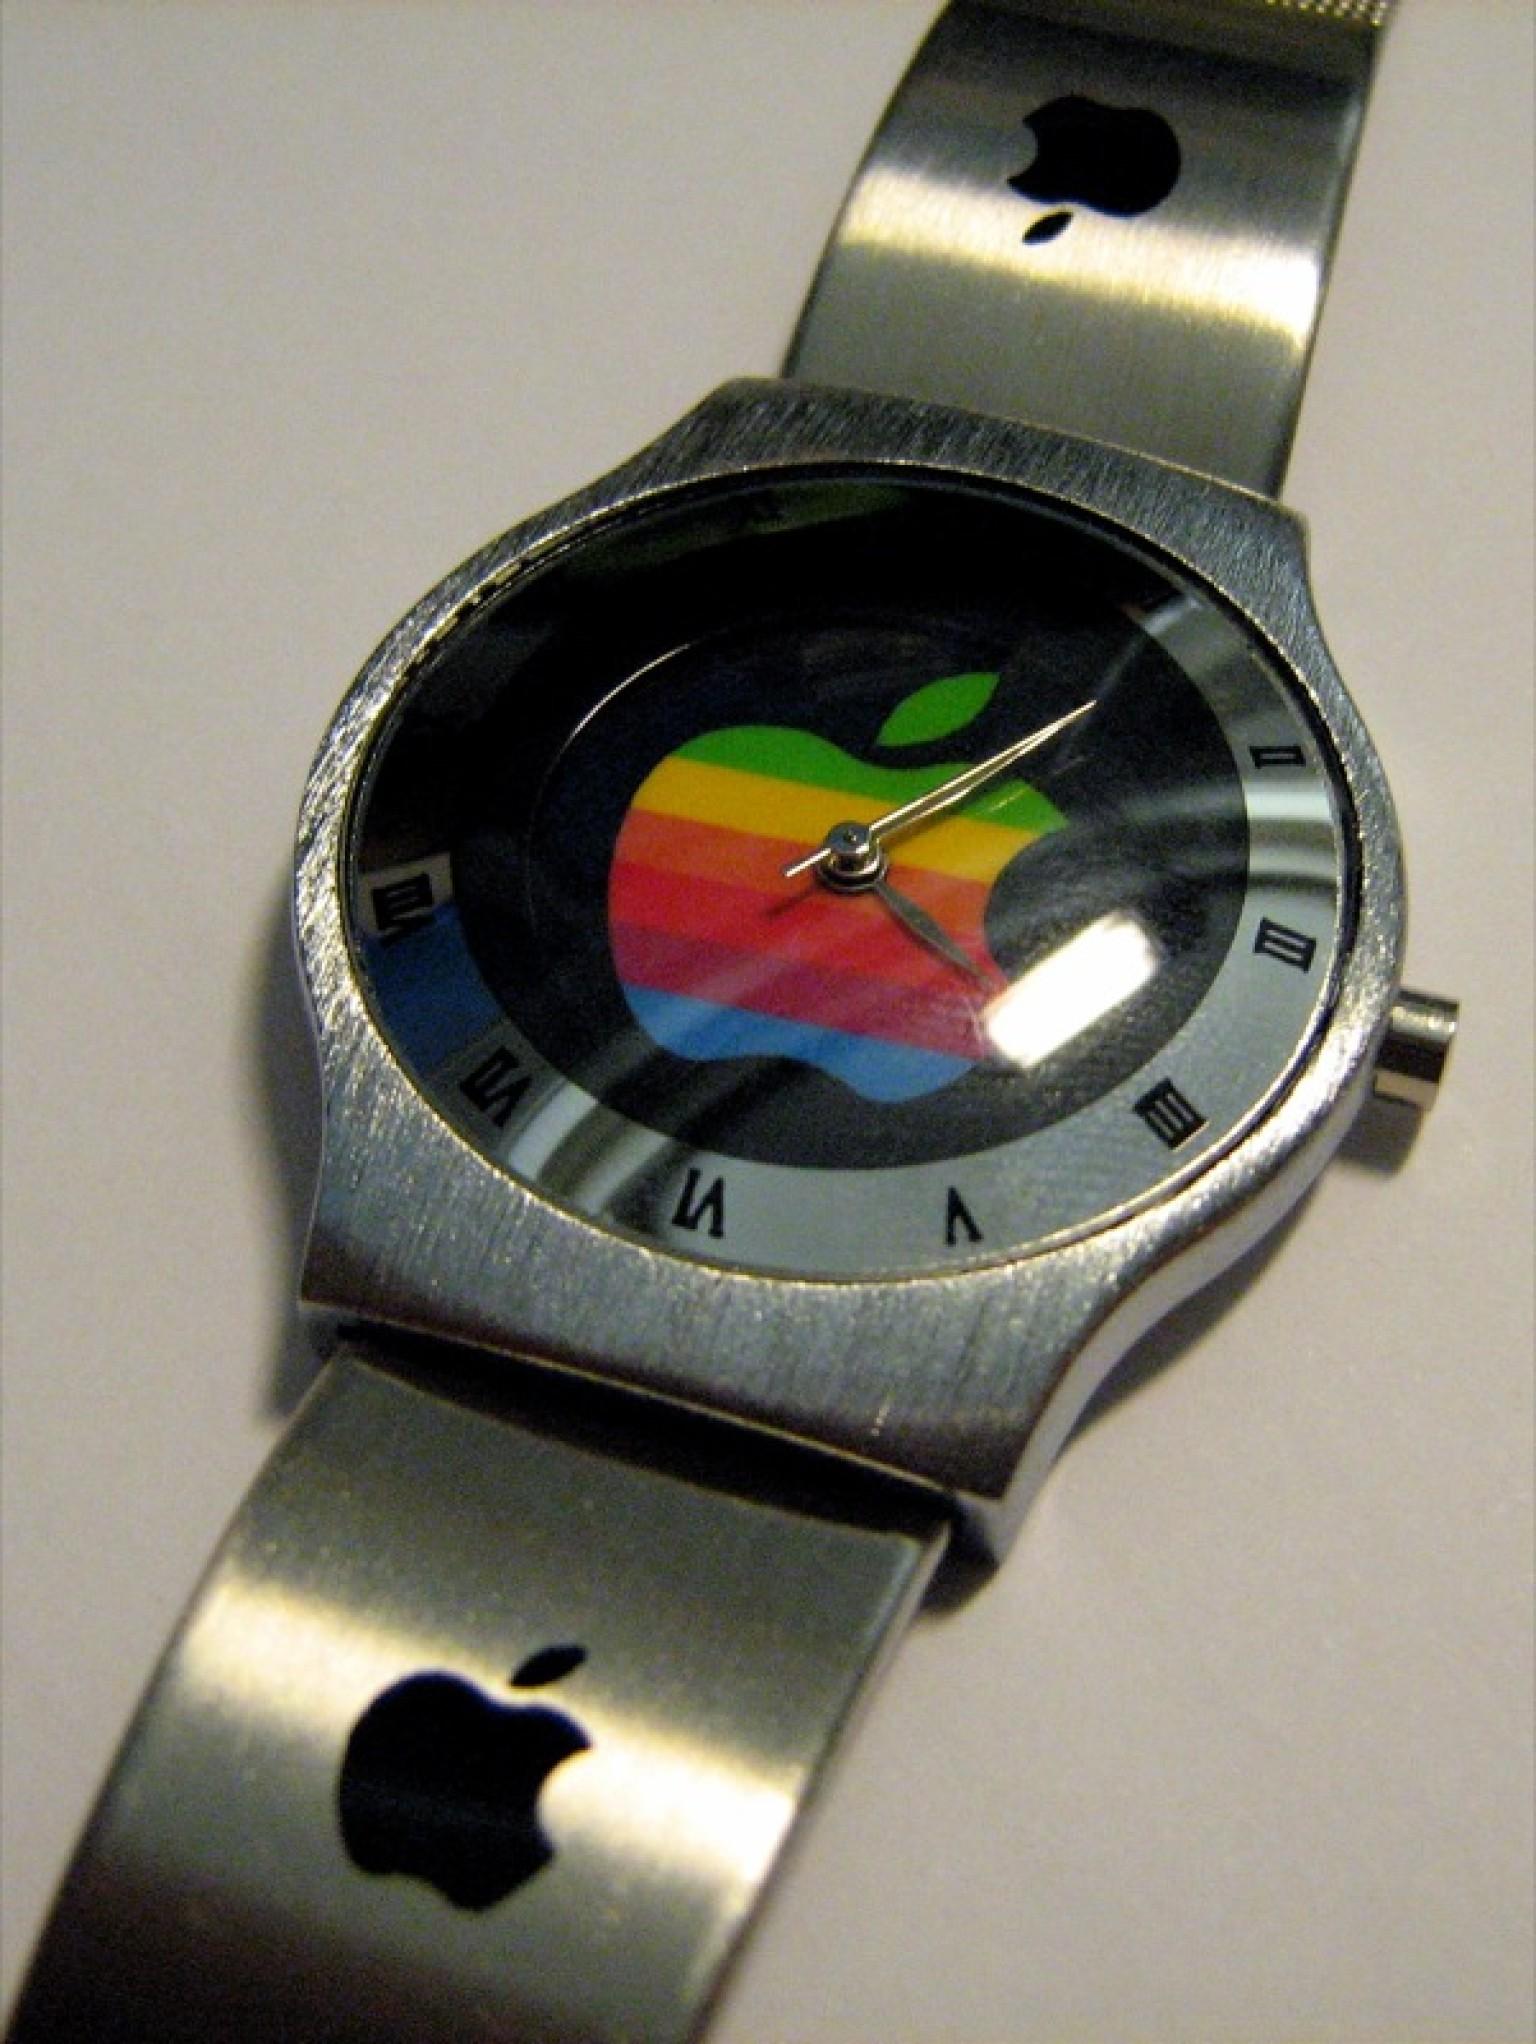 ... watch patent apple watch price apple watch concept apple watch phone